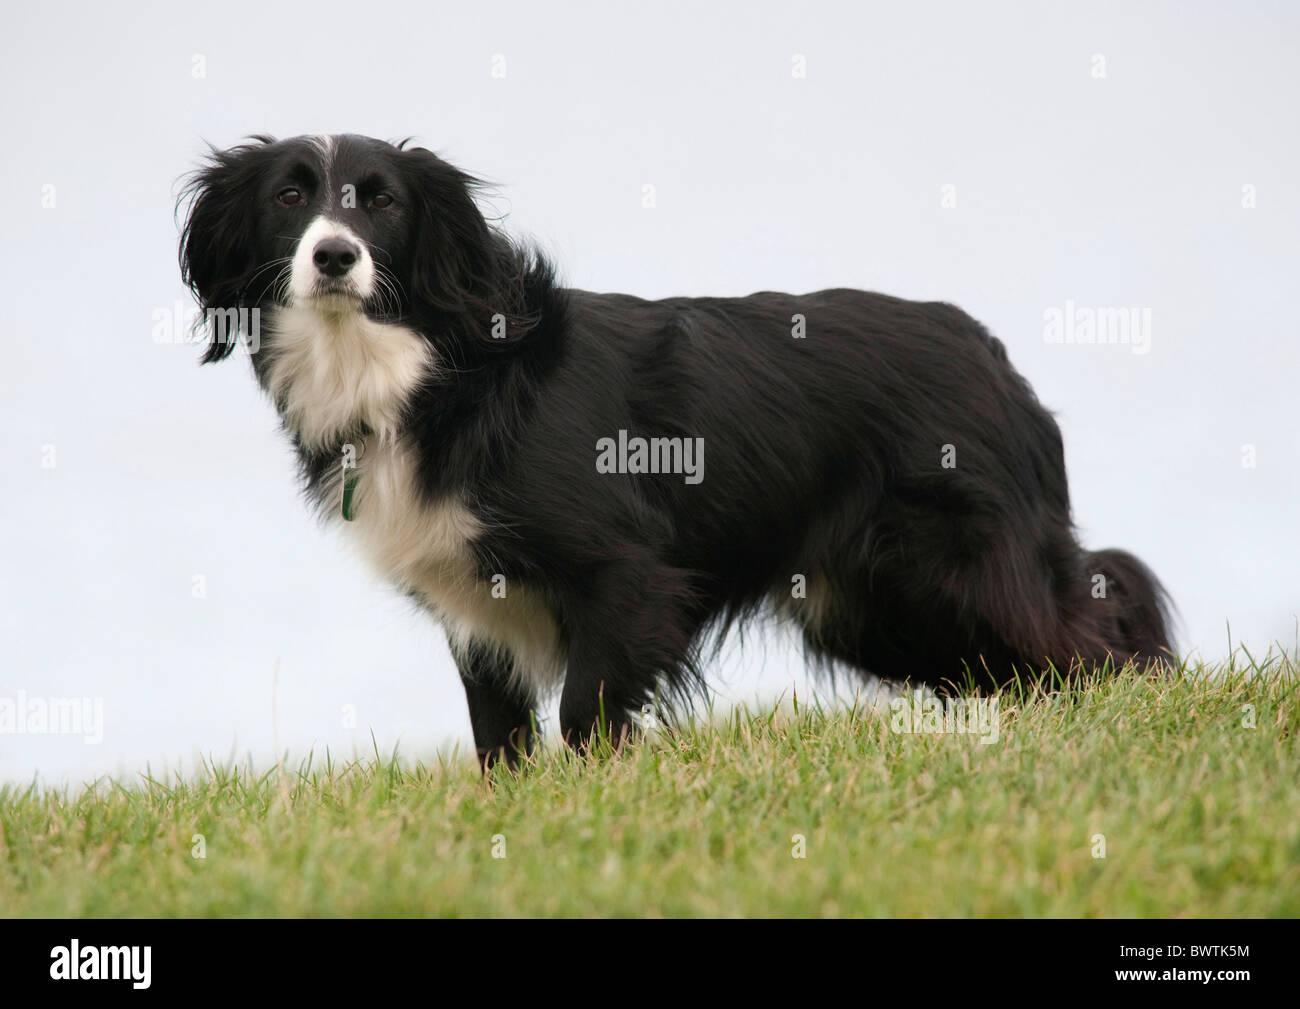 Collie Crossbred Dog UK - Stock Image